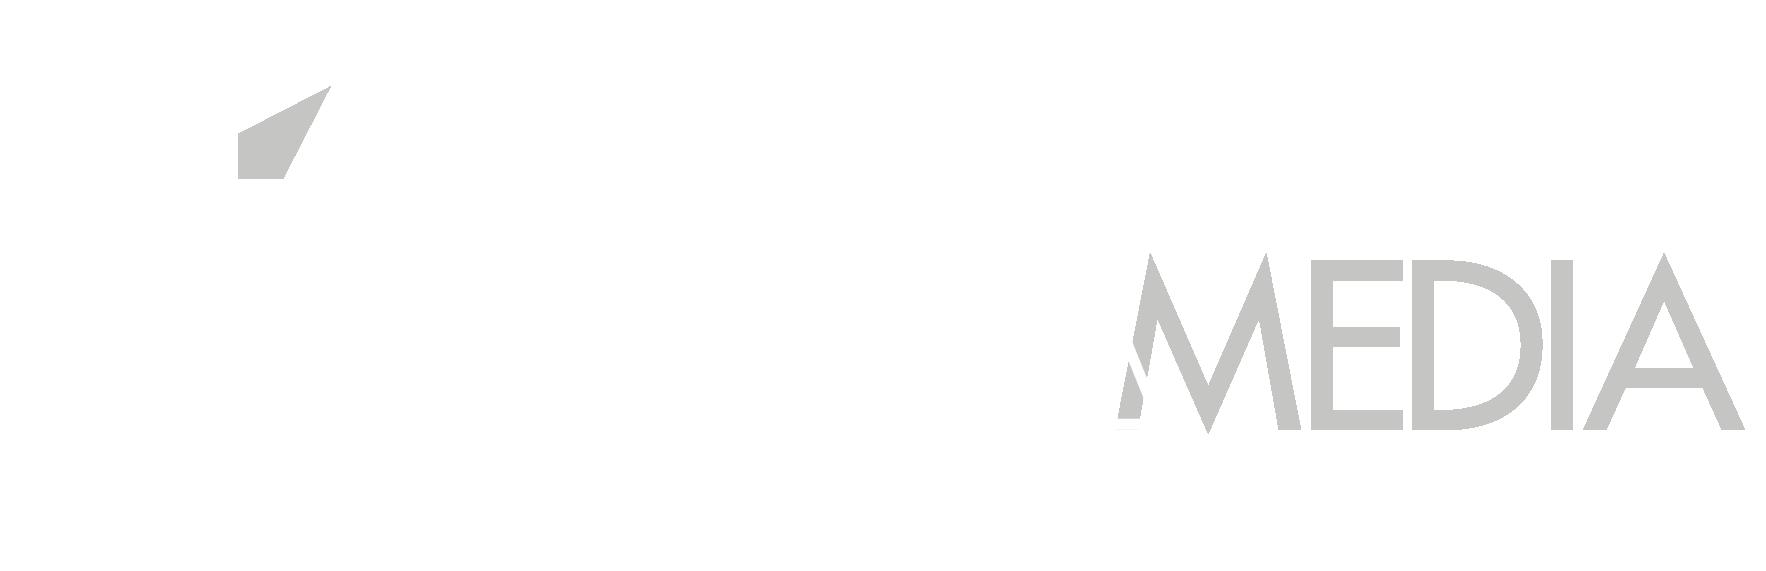 AlaneraMedia